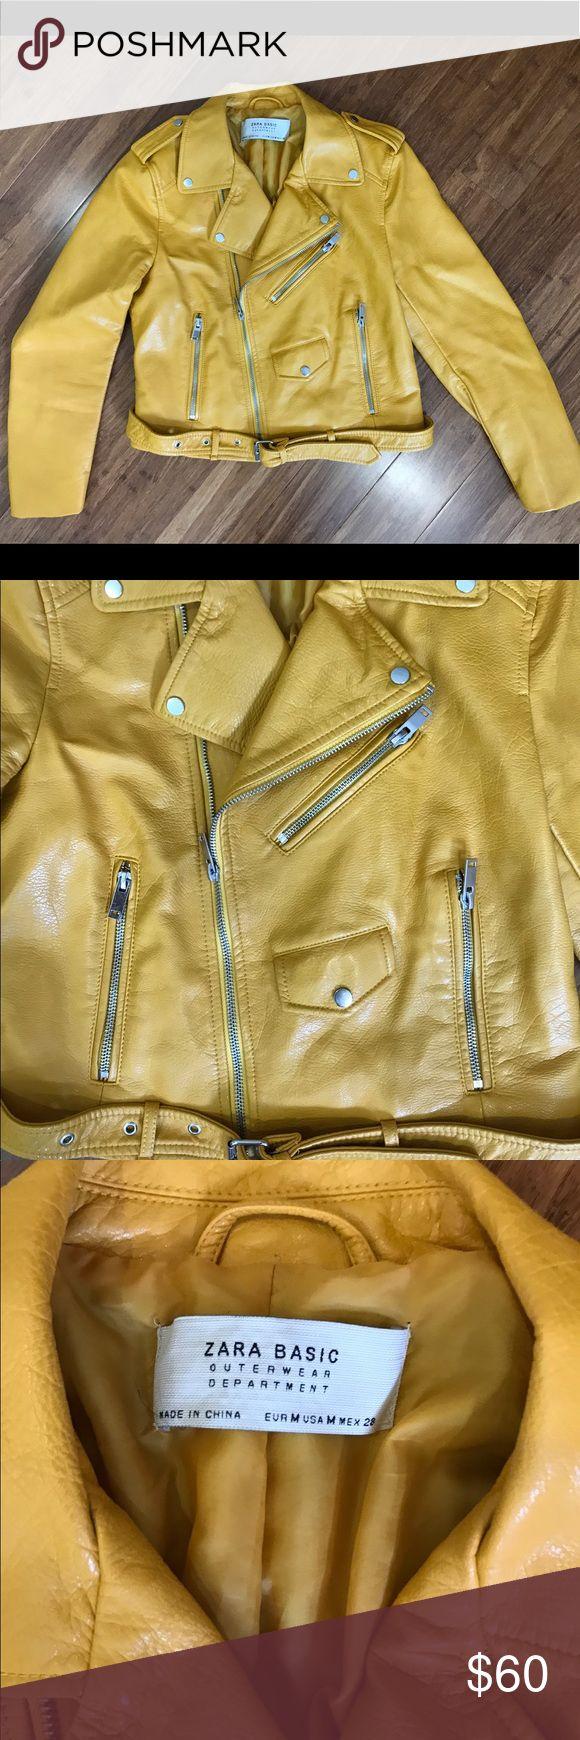 Leather jacket yellow zara - Golden Yellow Zara Faux Leather Jacket